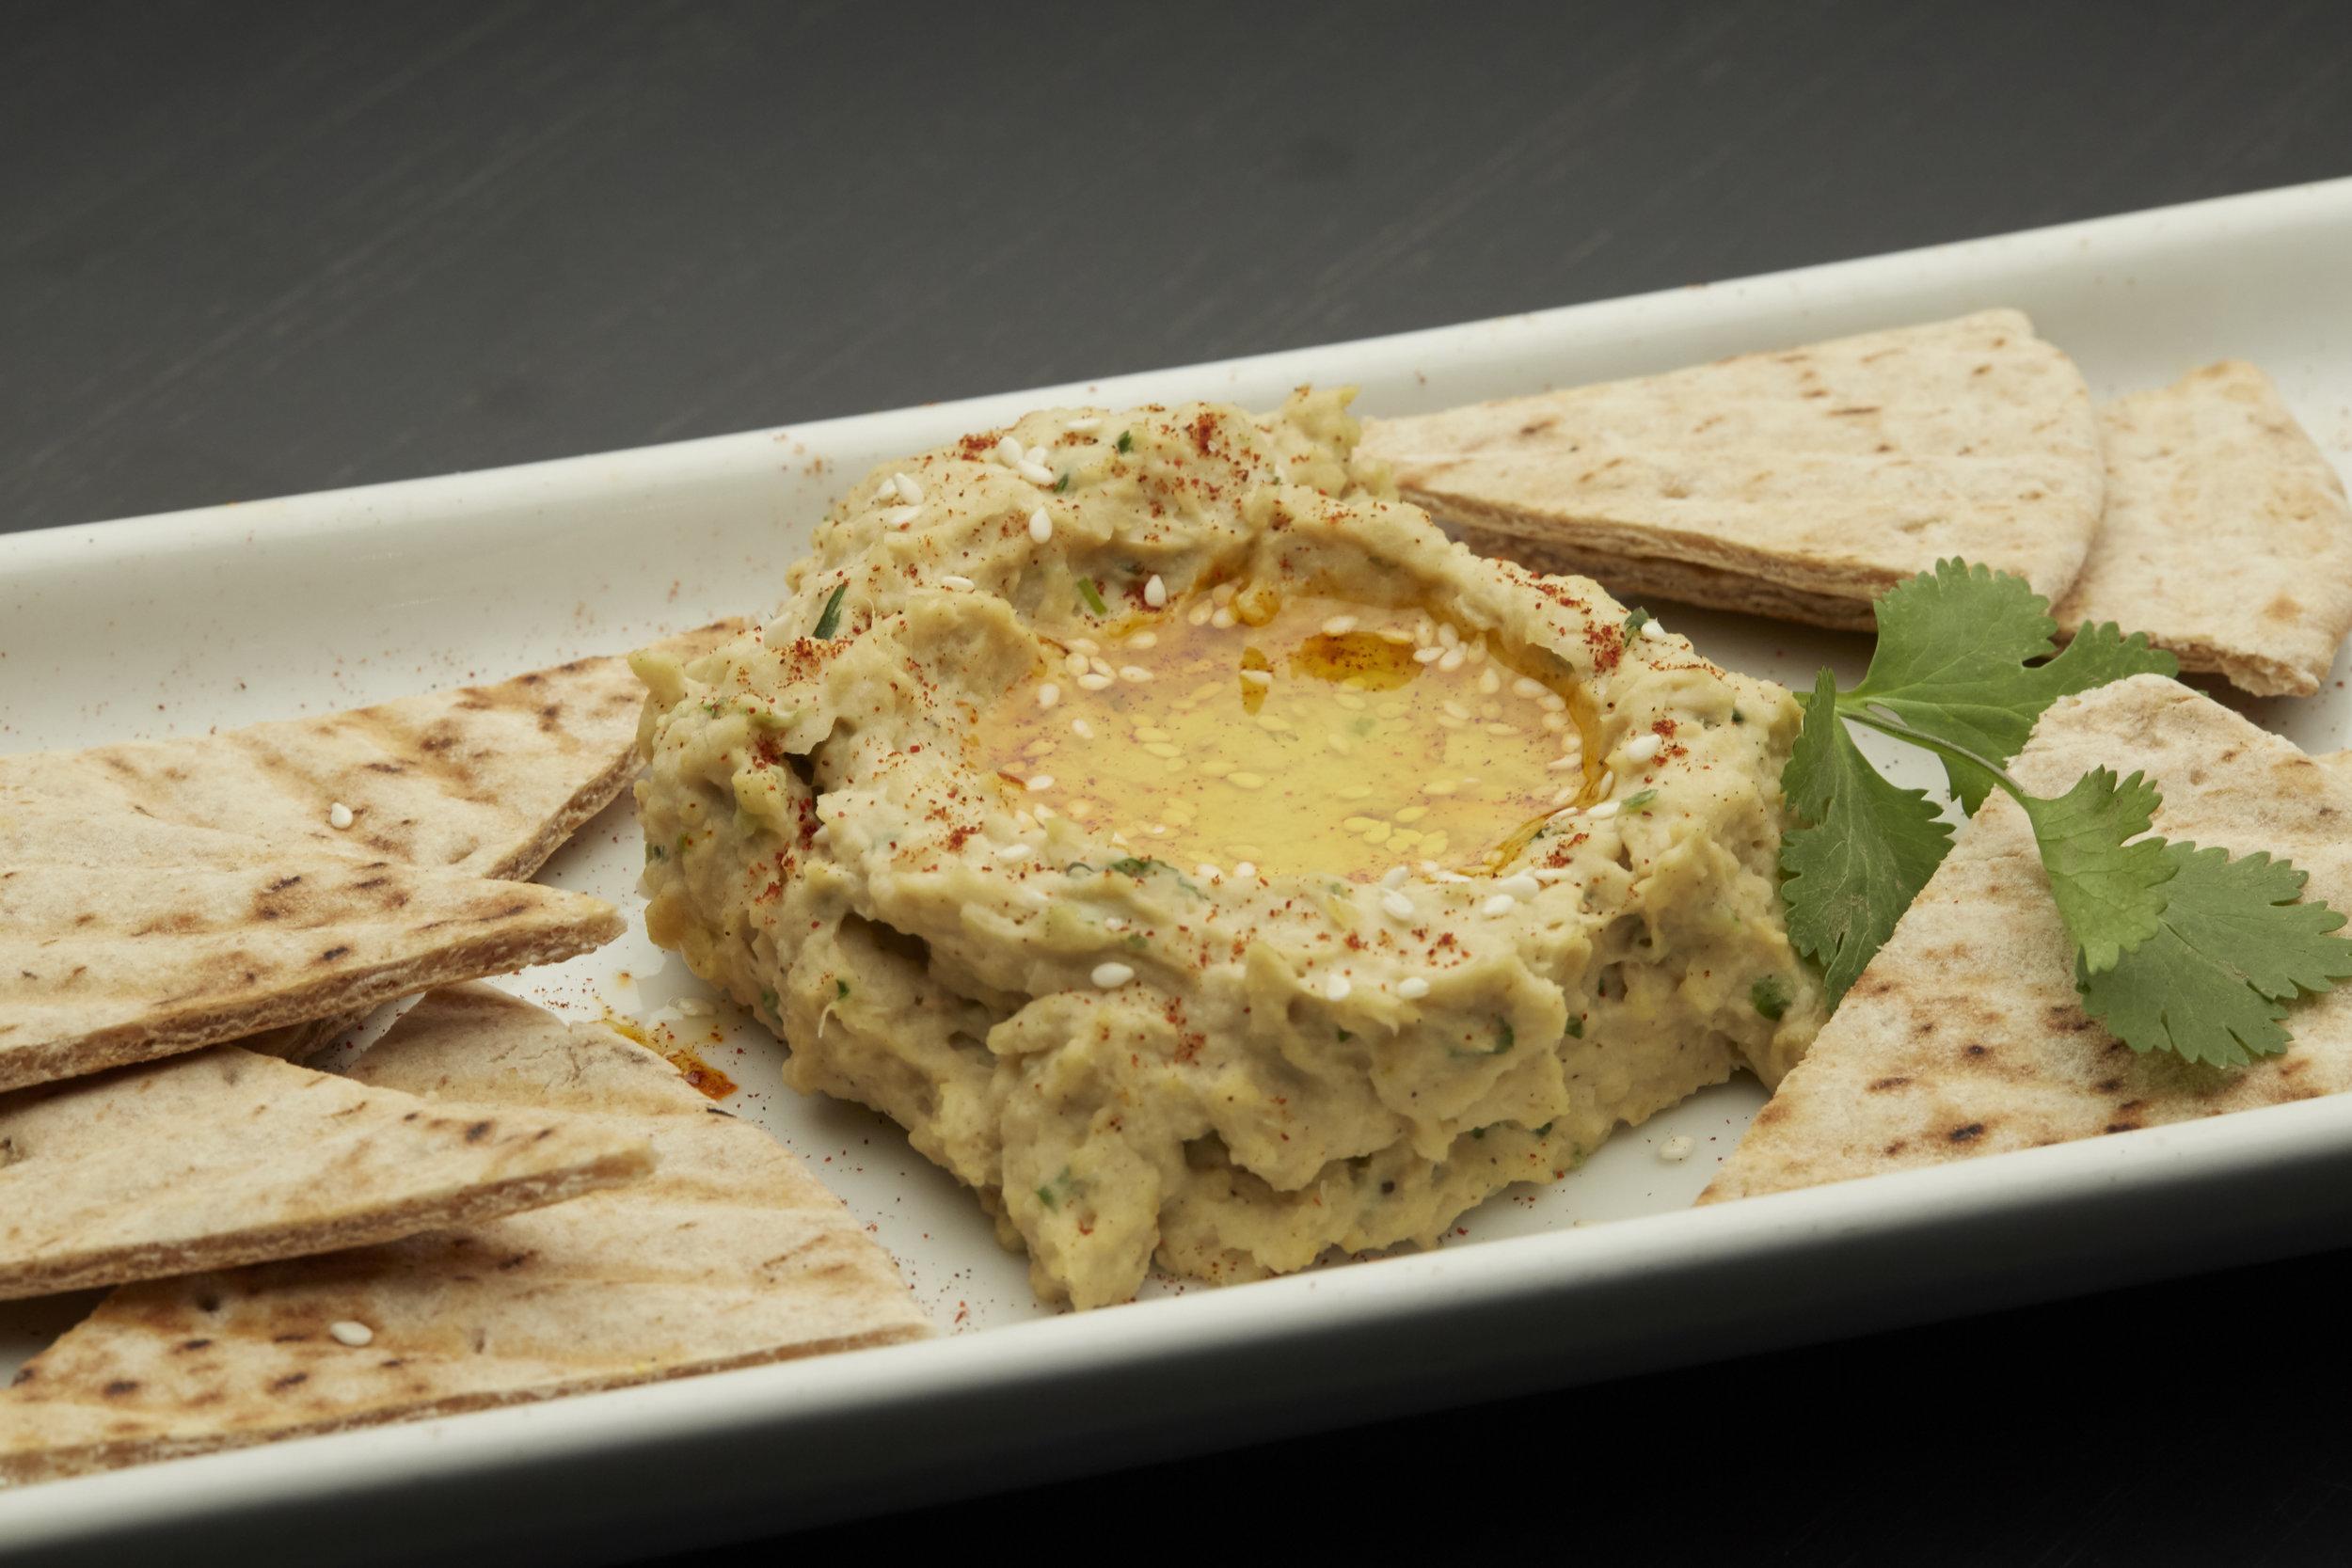 Islander Hummus - Our very own hummus served with multigrain pita wedges.